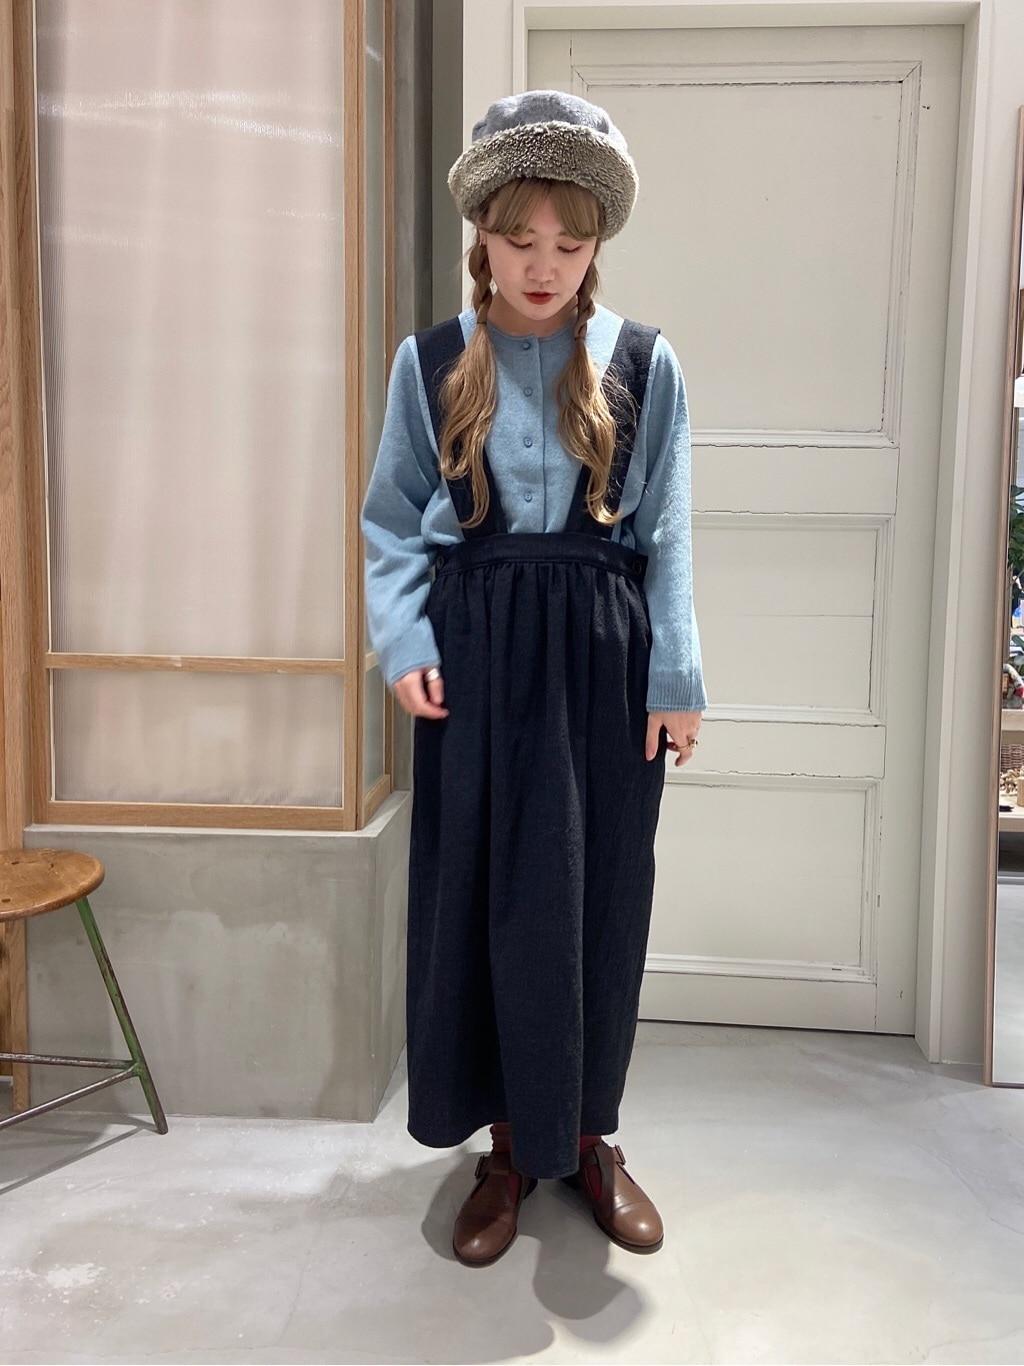 bulle de savon 渋谷スクランブルスクエア 身長:160cm 2020.11.16